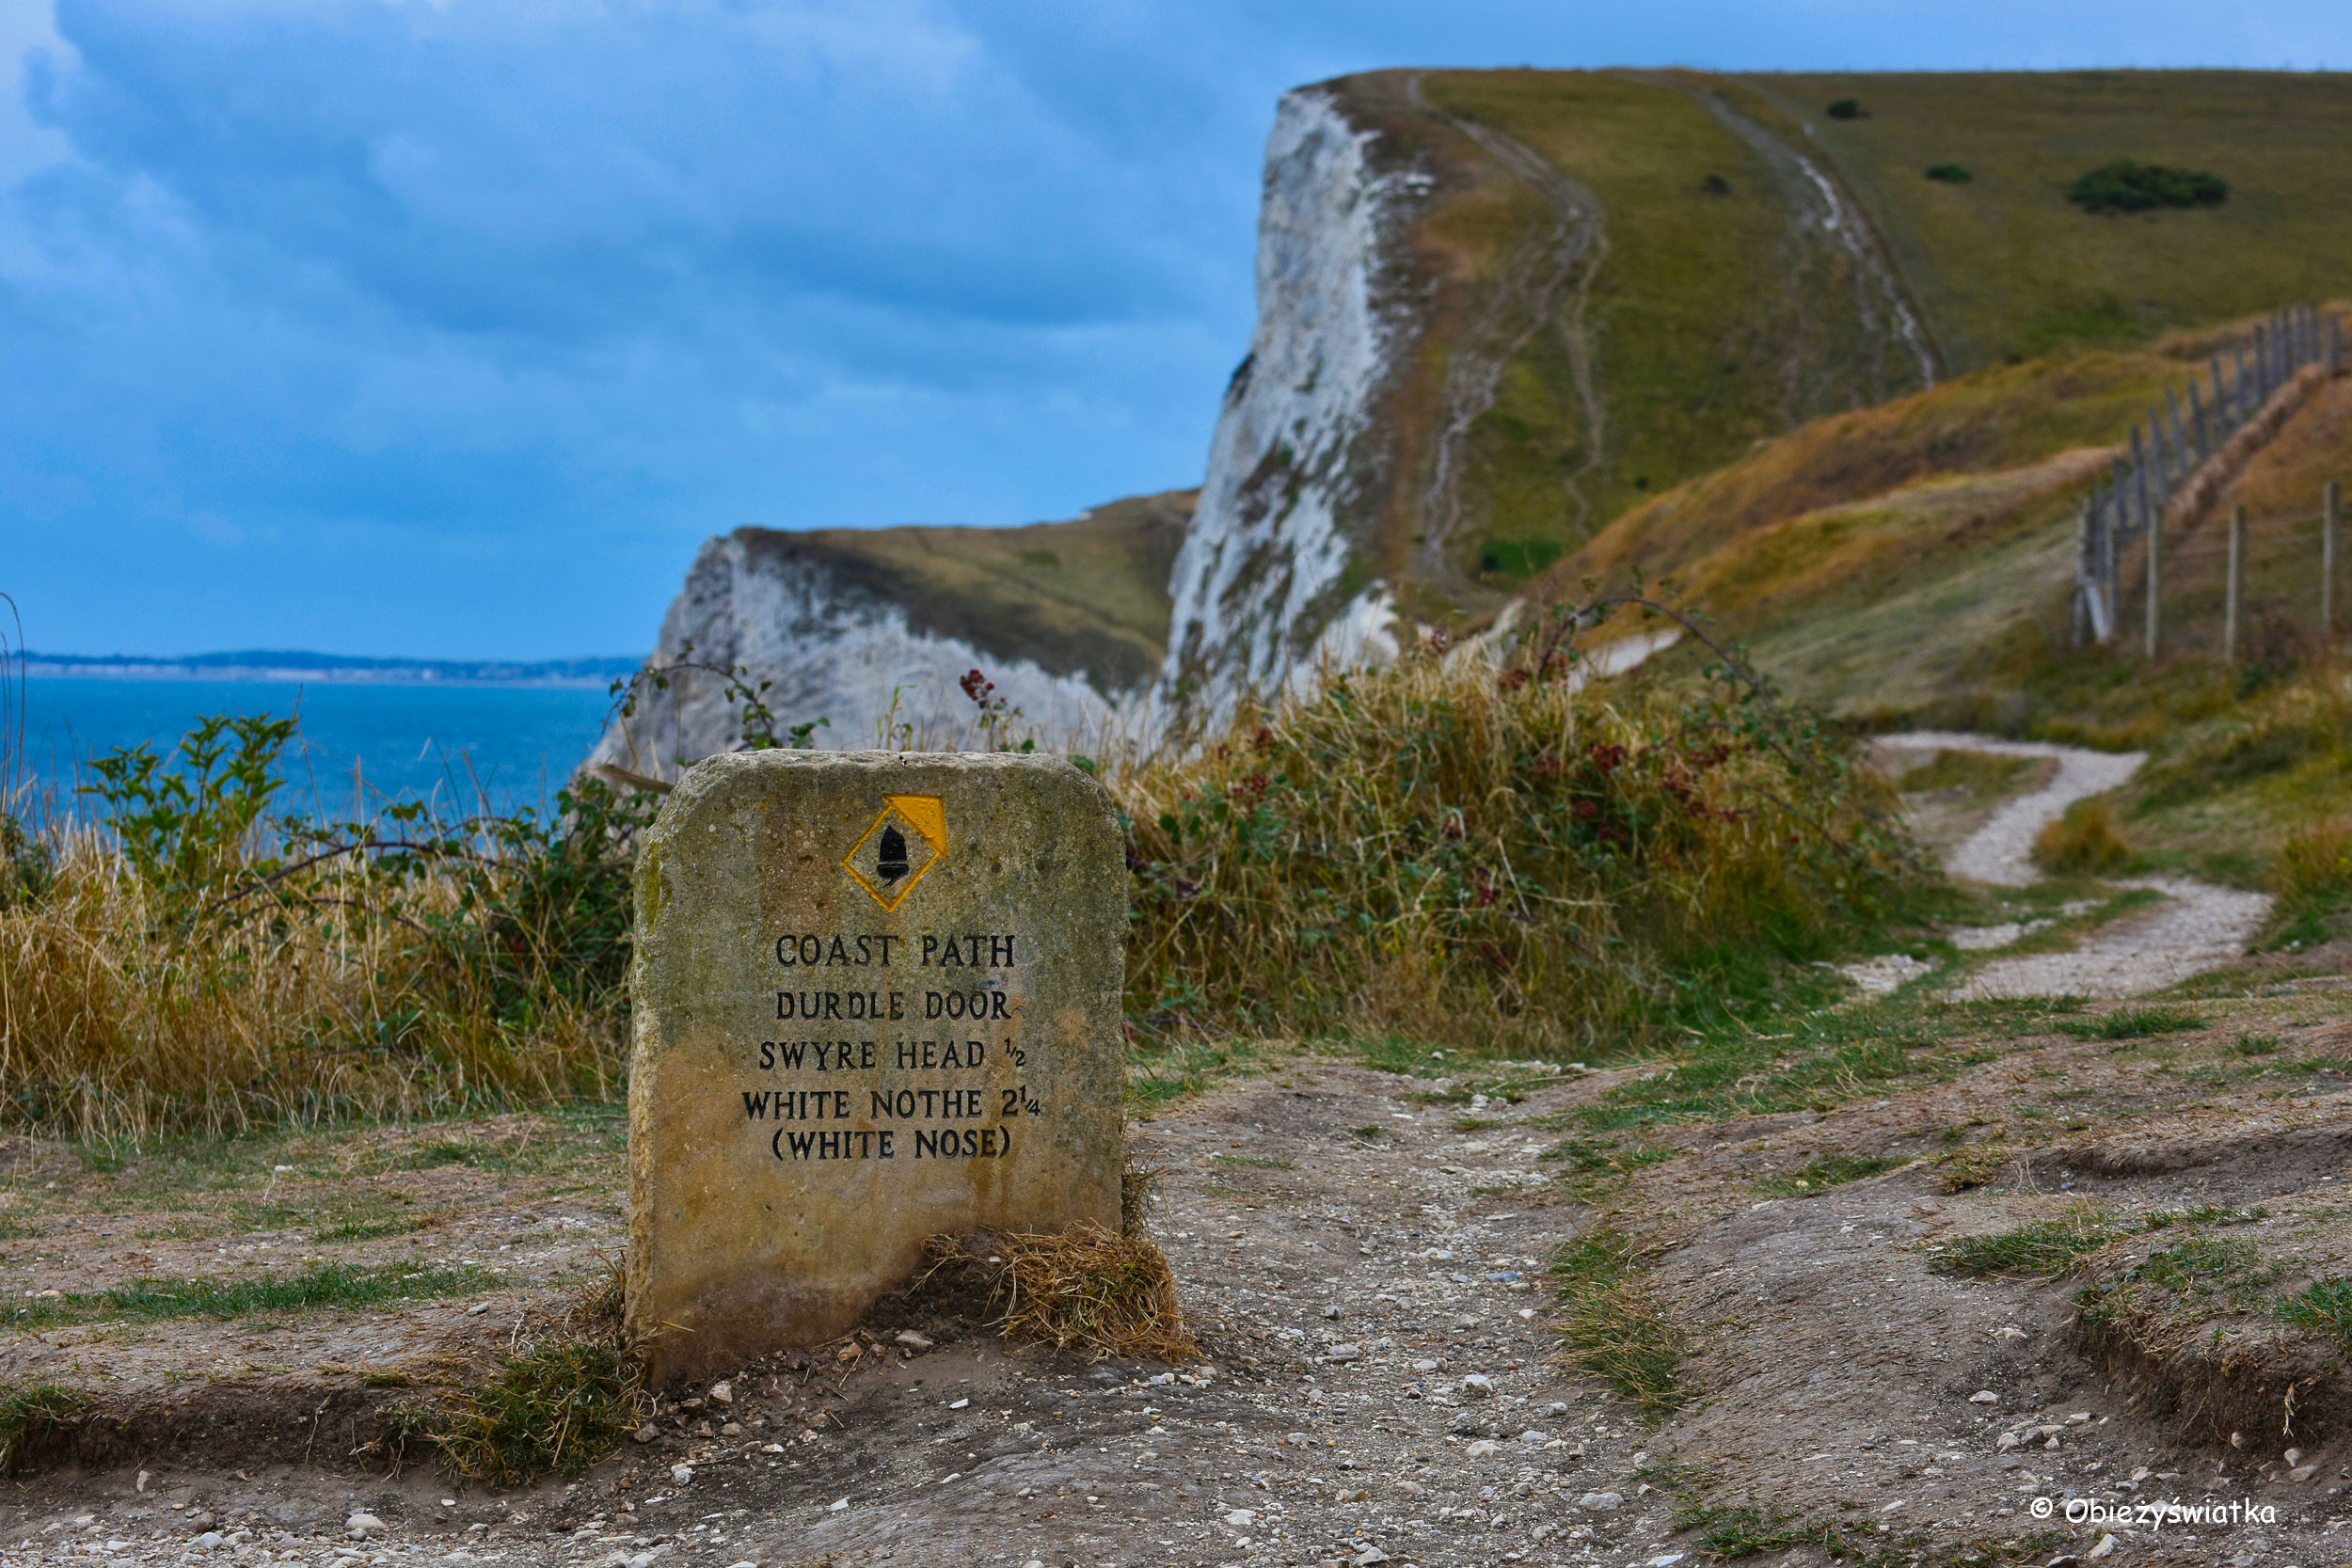 Durdle Door - część szlaku South West Coast Path, UK